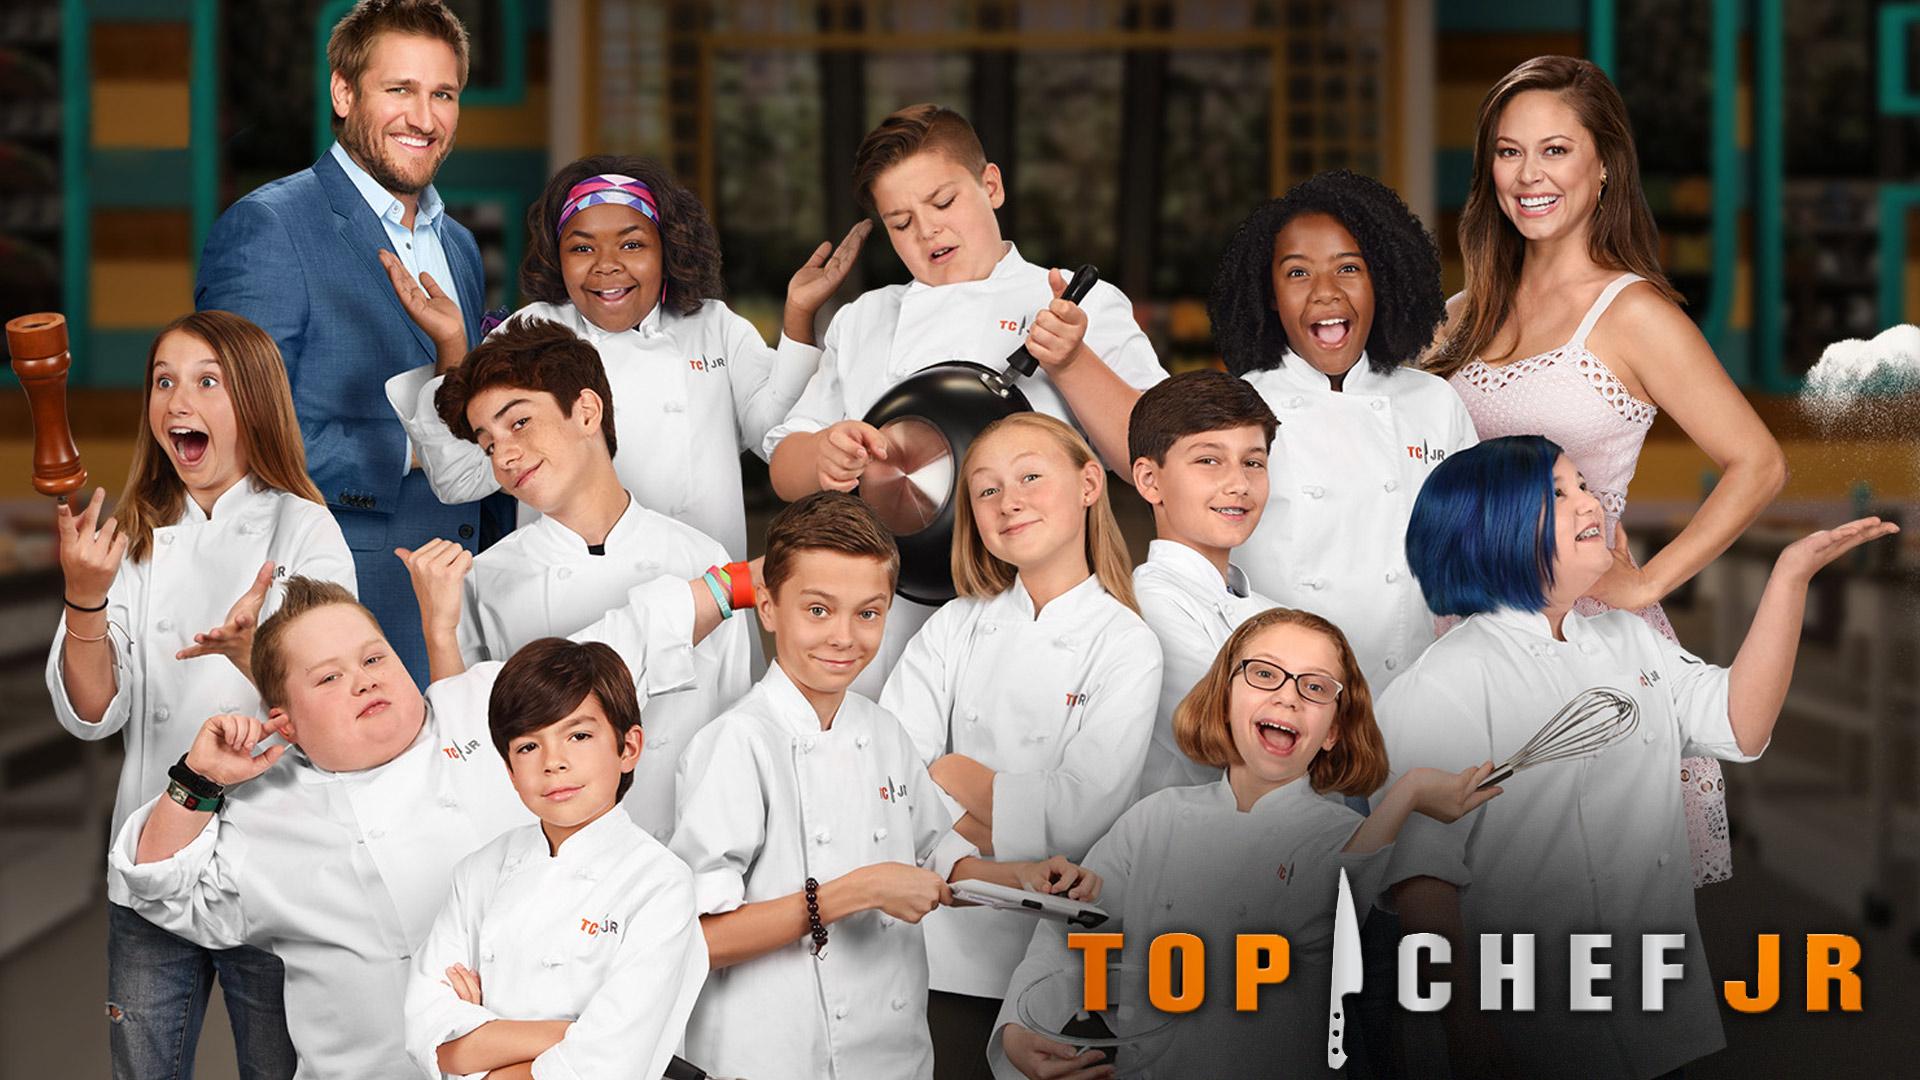 Top Chef Jr., Season 1